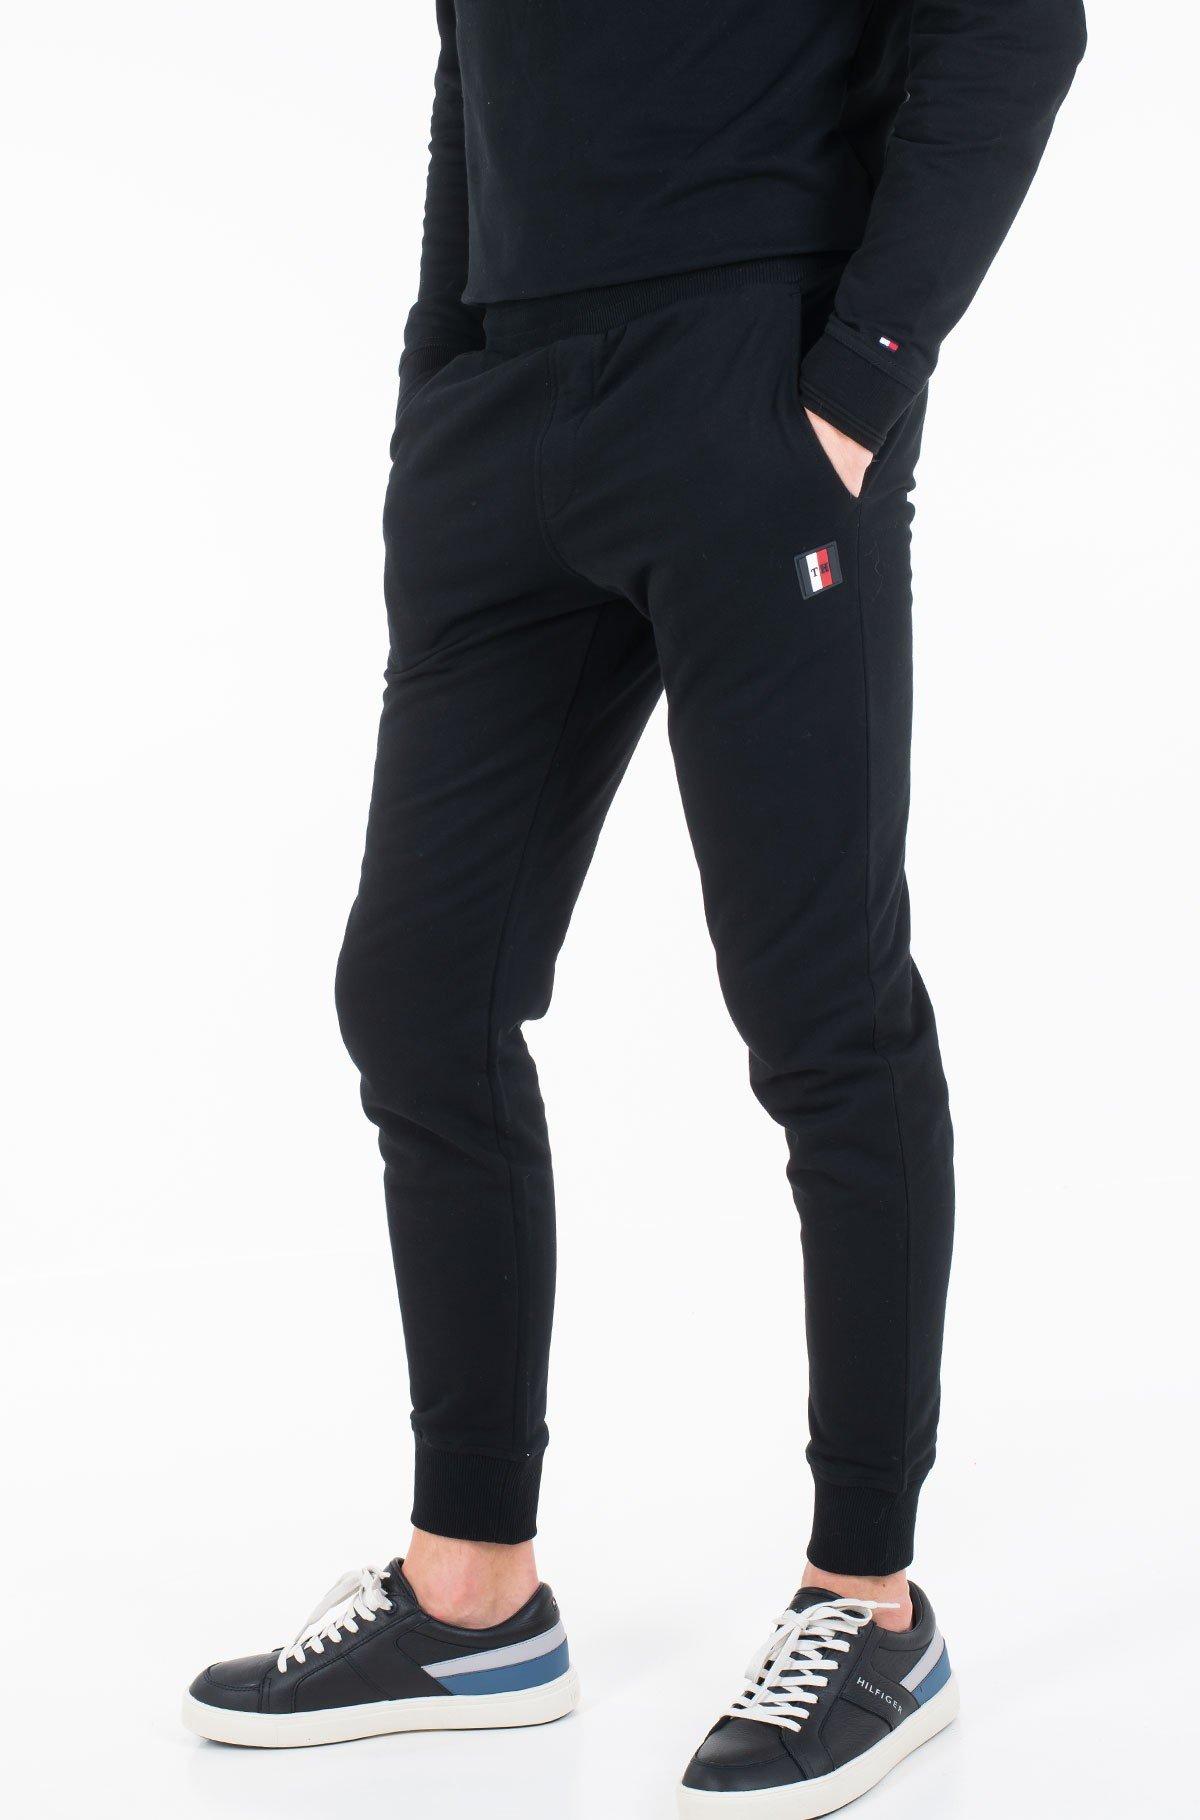 Sportinės kelnės TH FLEX SWEATPANTS-full-1